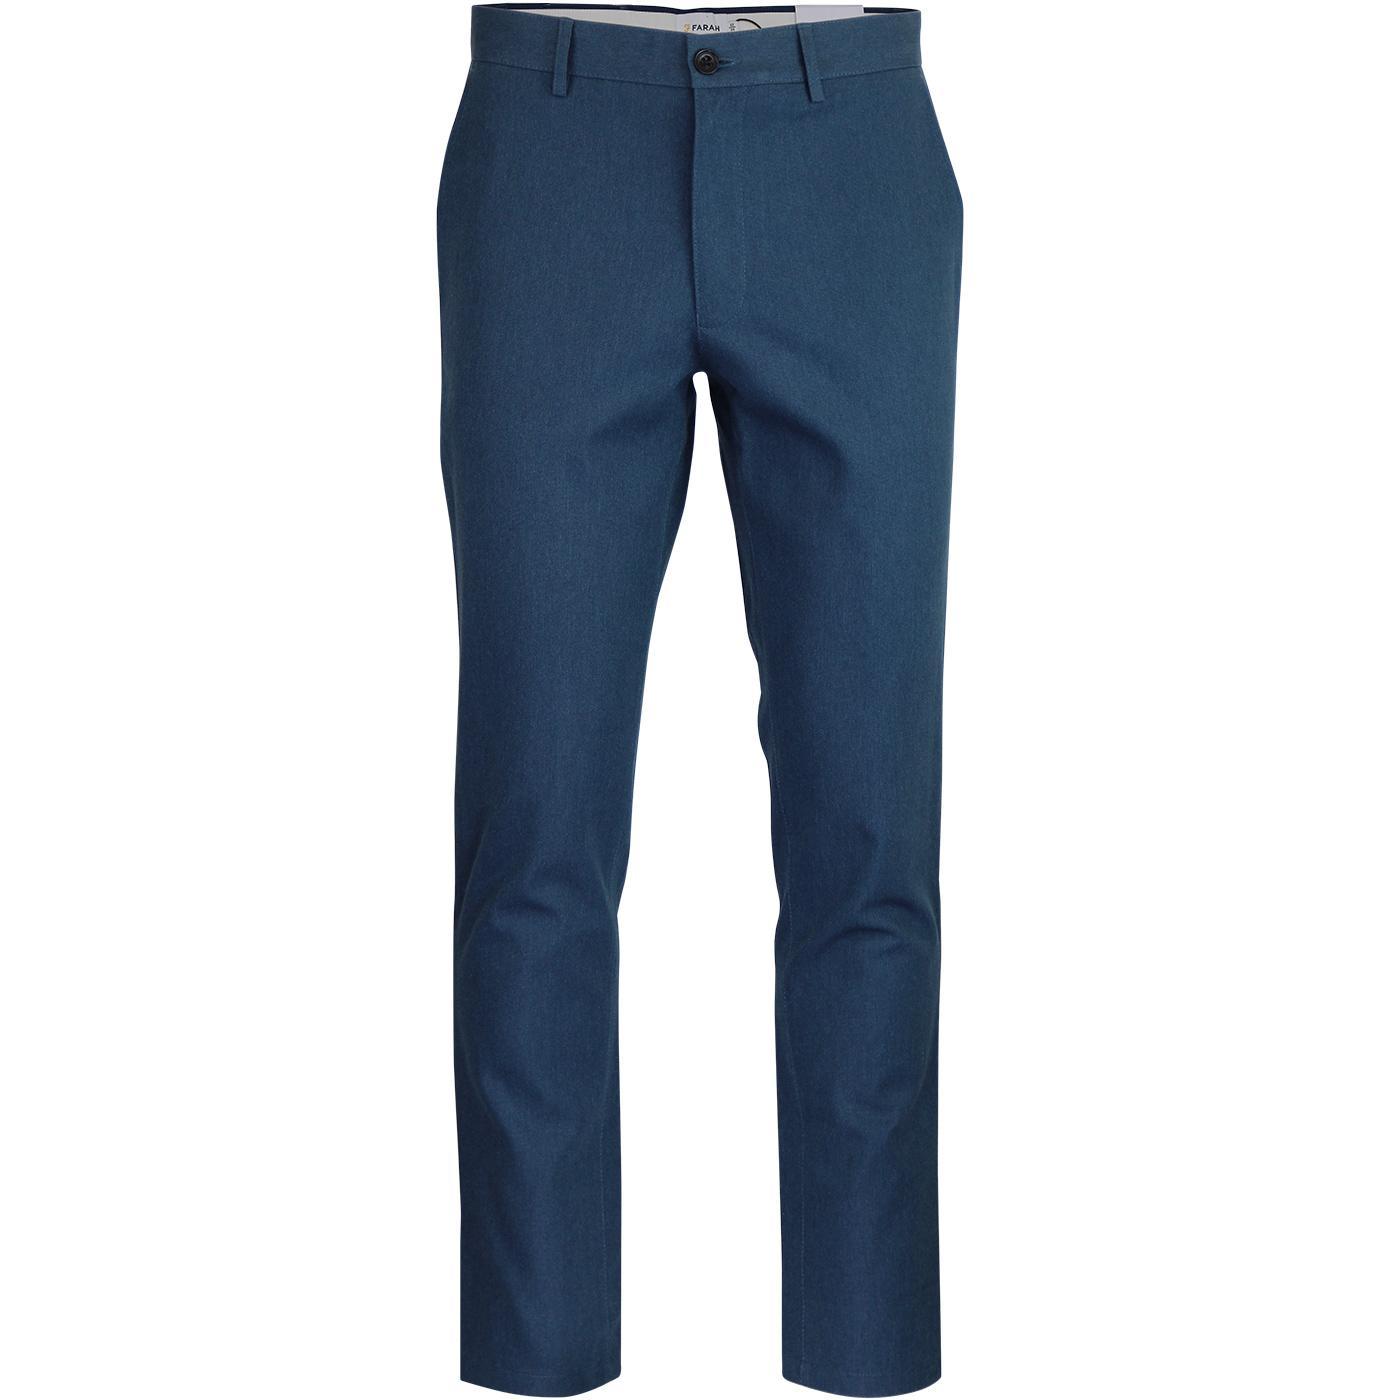 Elm FARAH Retro 60s Mod Hopsack Trousers BLUE STAR